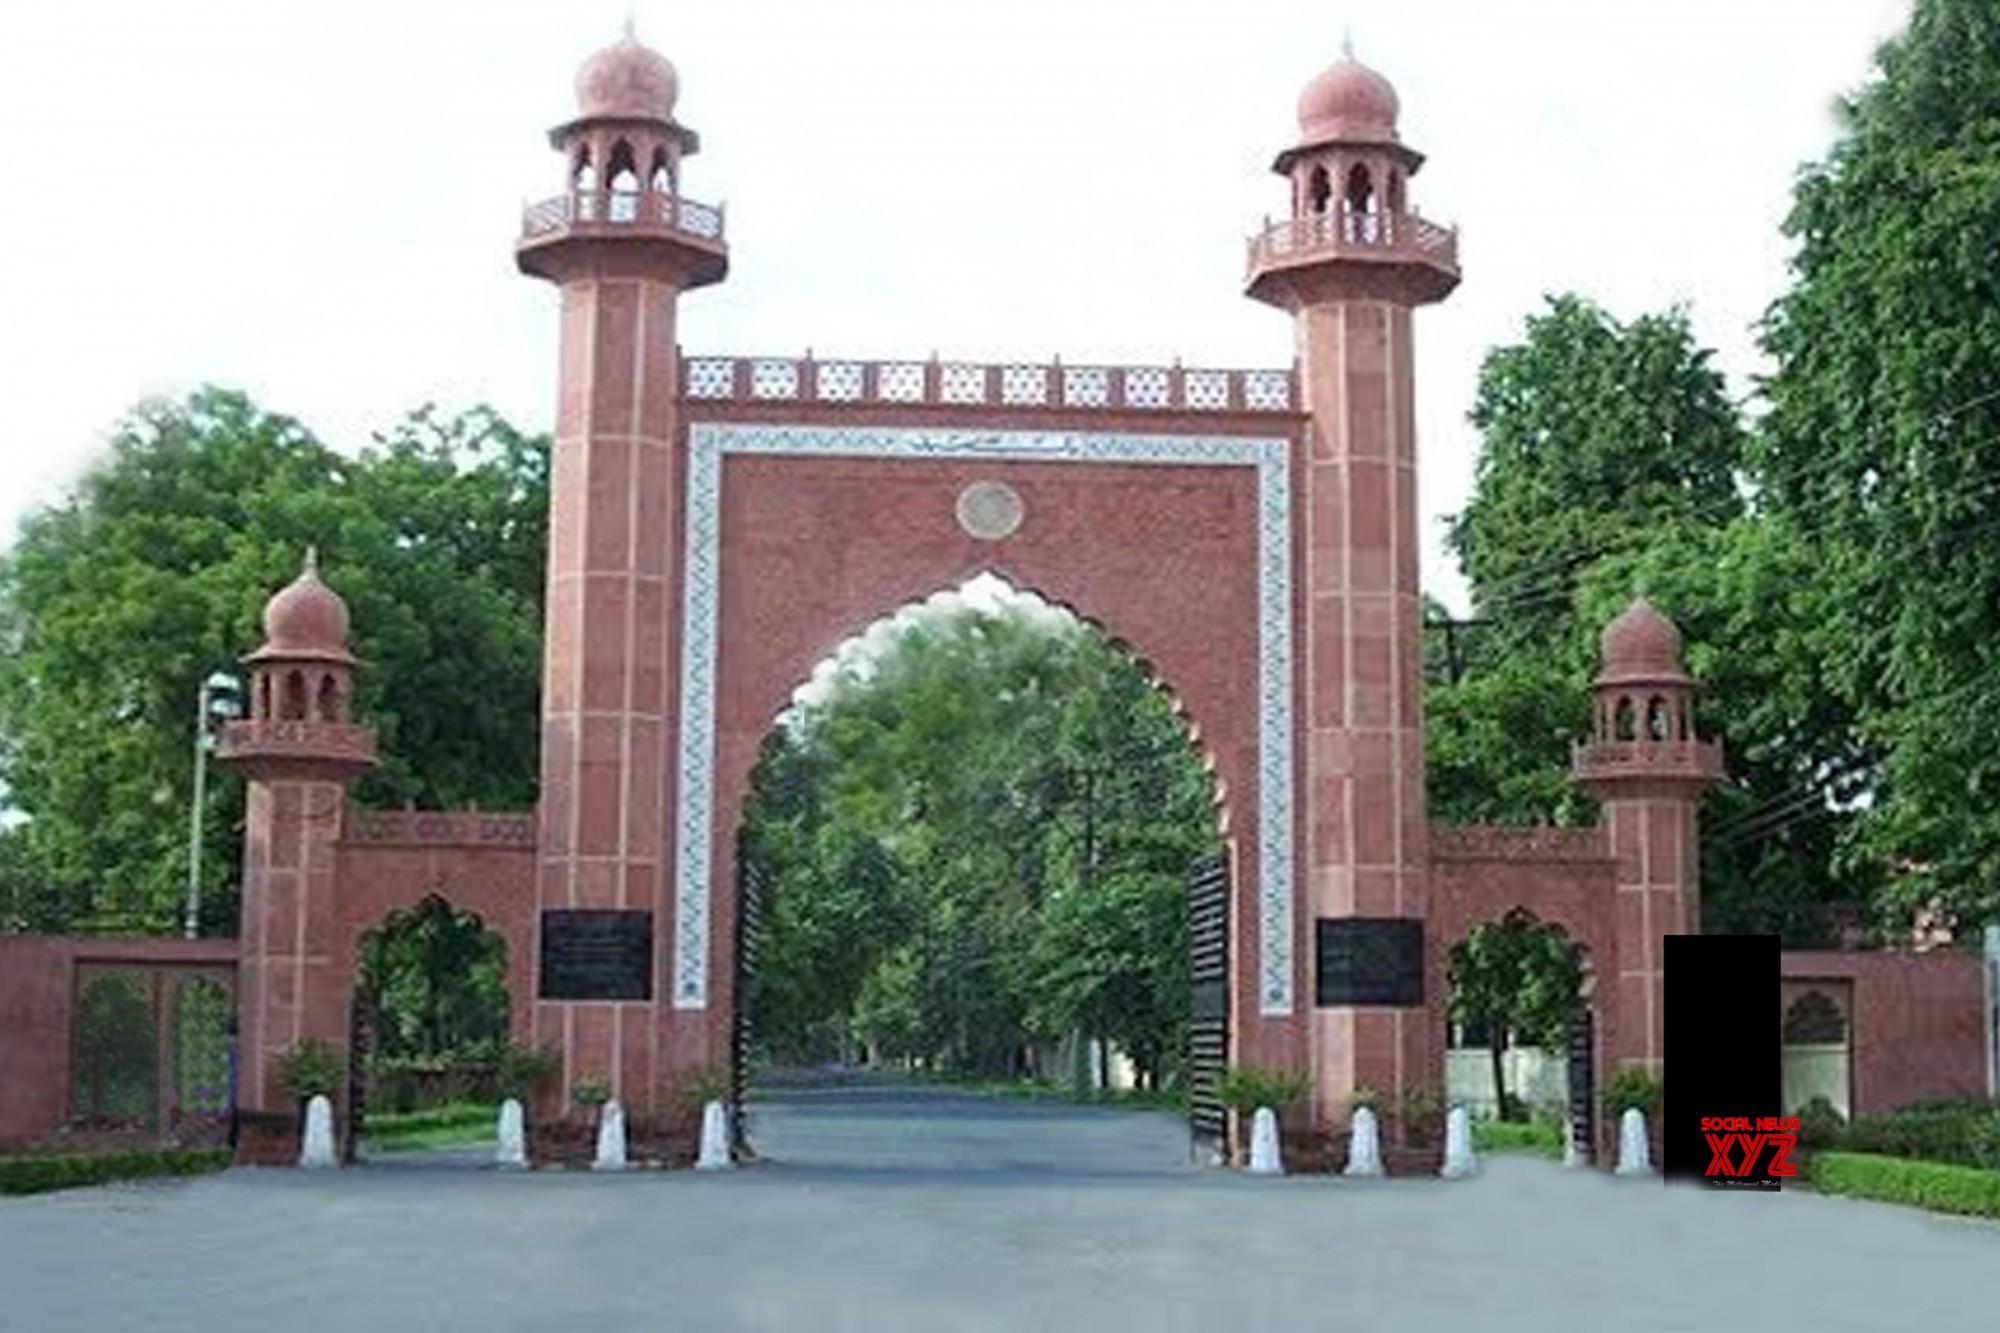 Seven-judge bench to decide minority status of Aligarh Muslim University